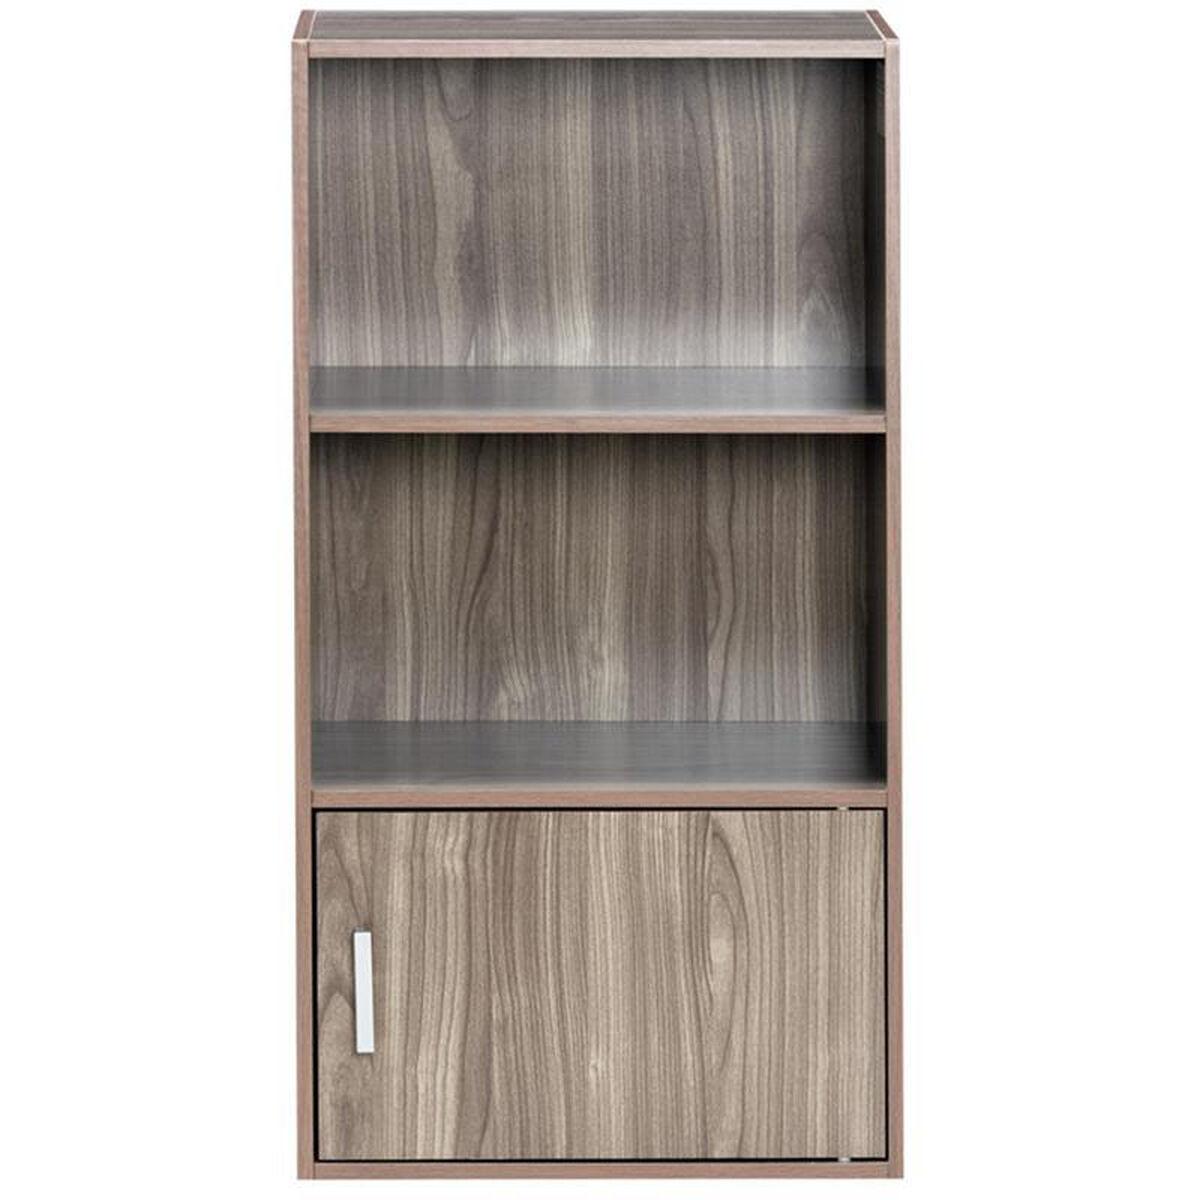 Small Bookshelf 50 6522WN